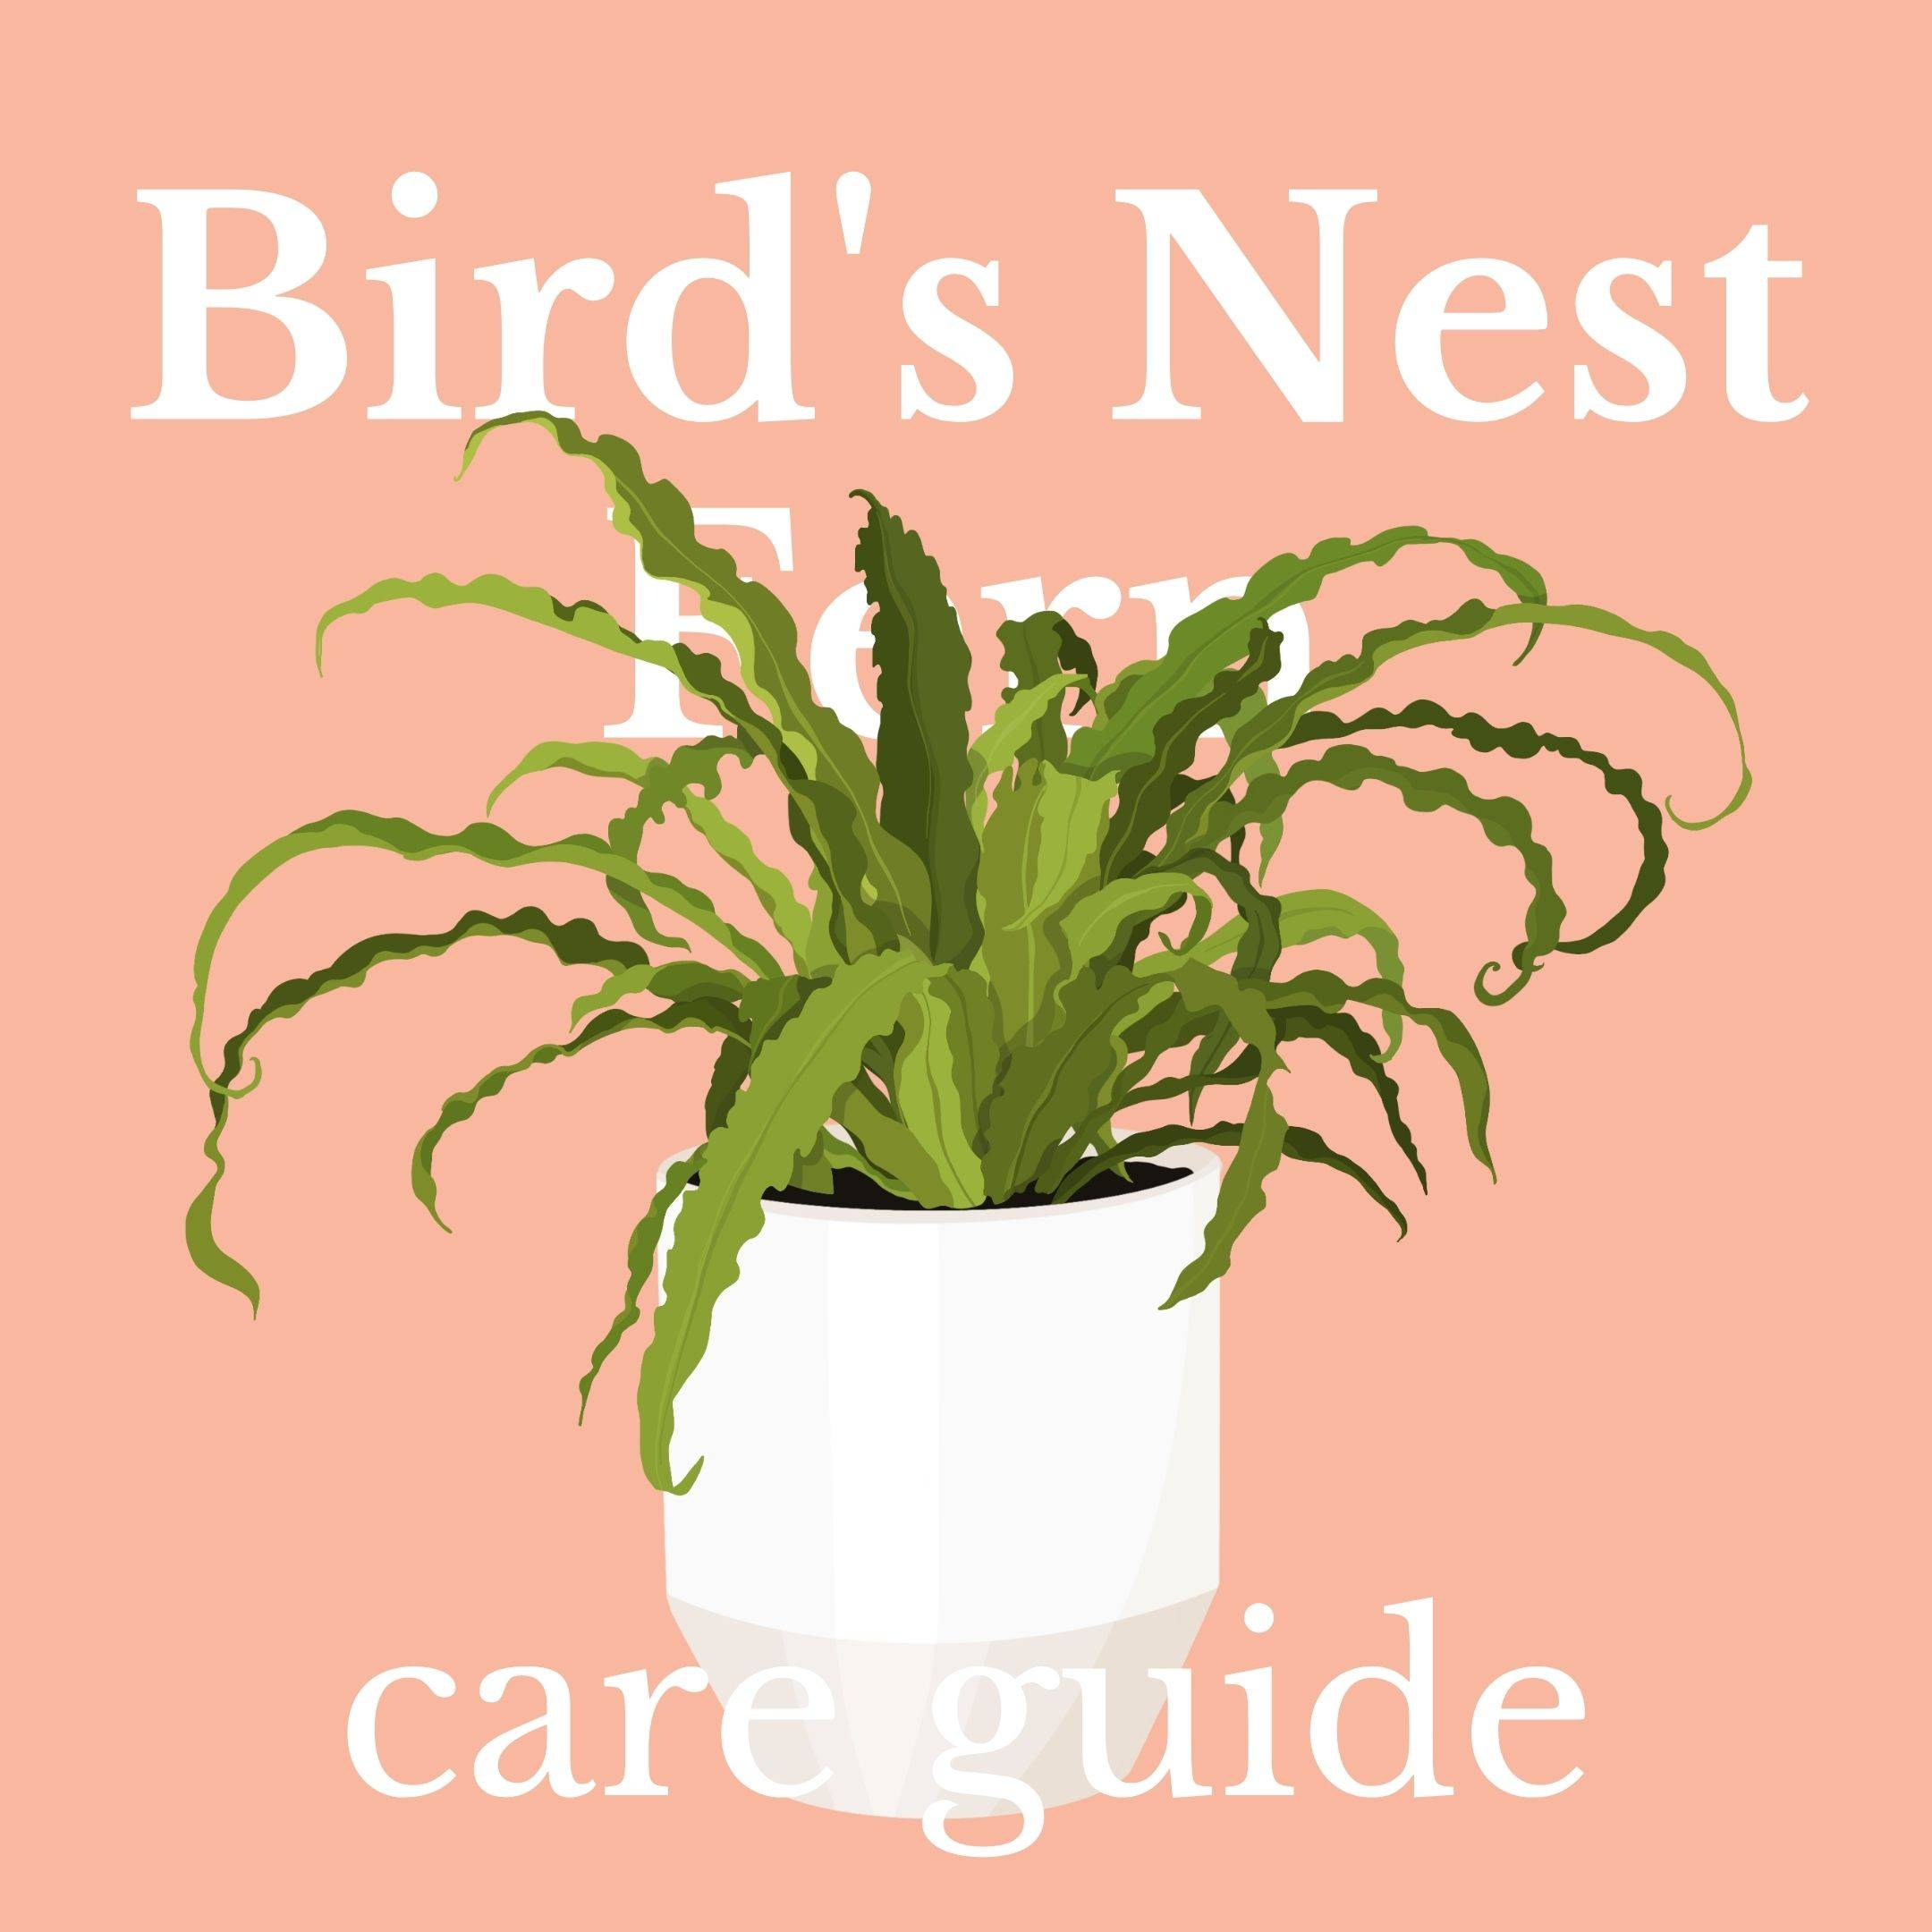 Drawing of bird's nest fern